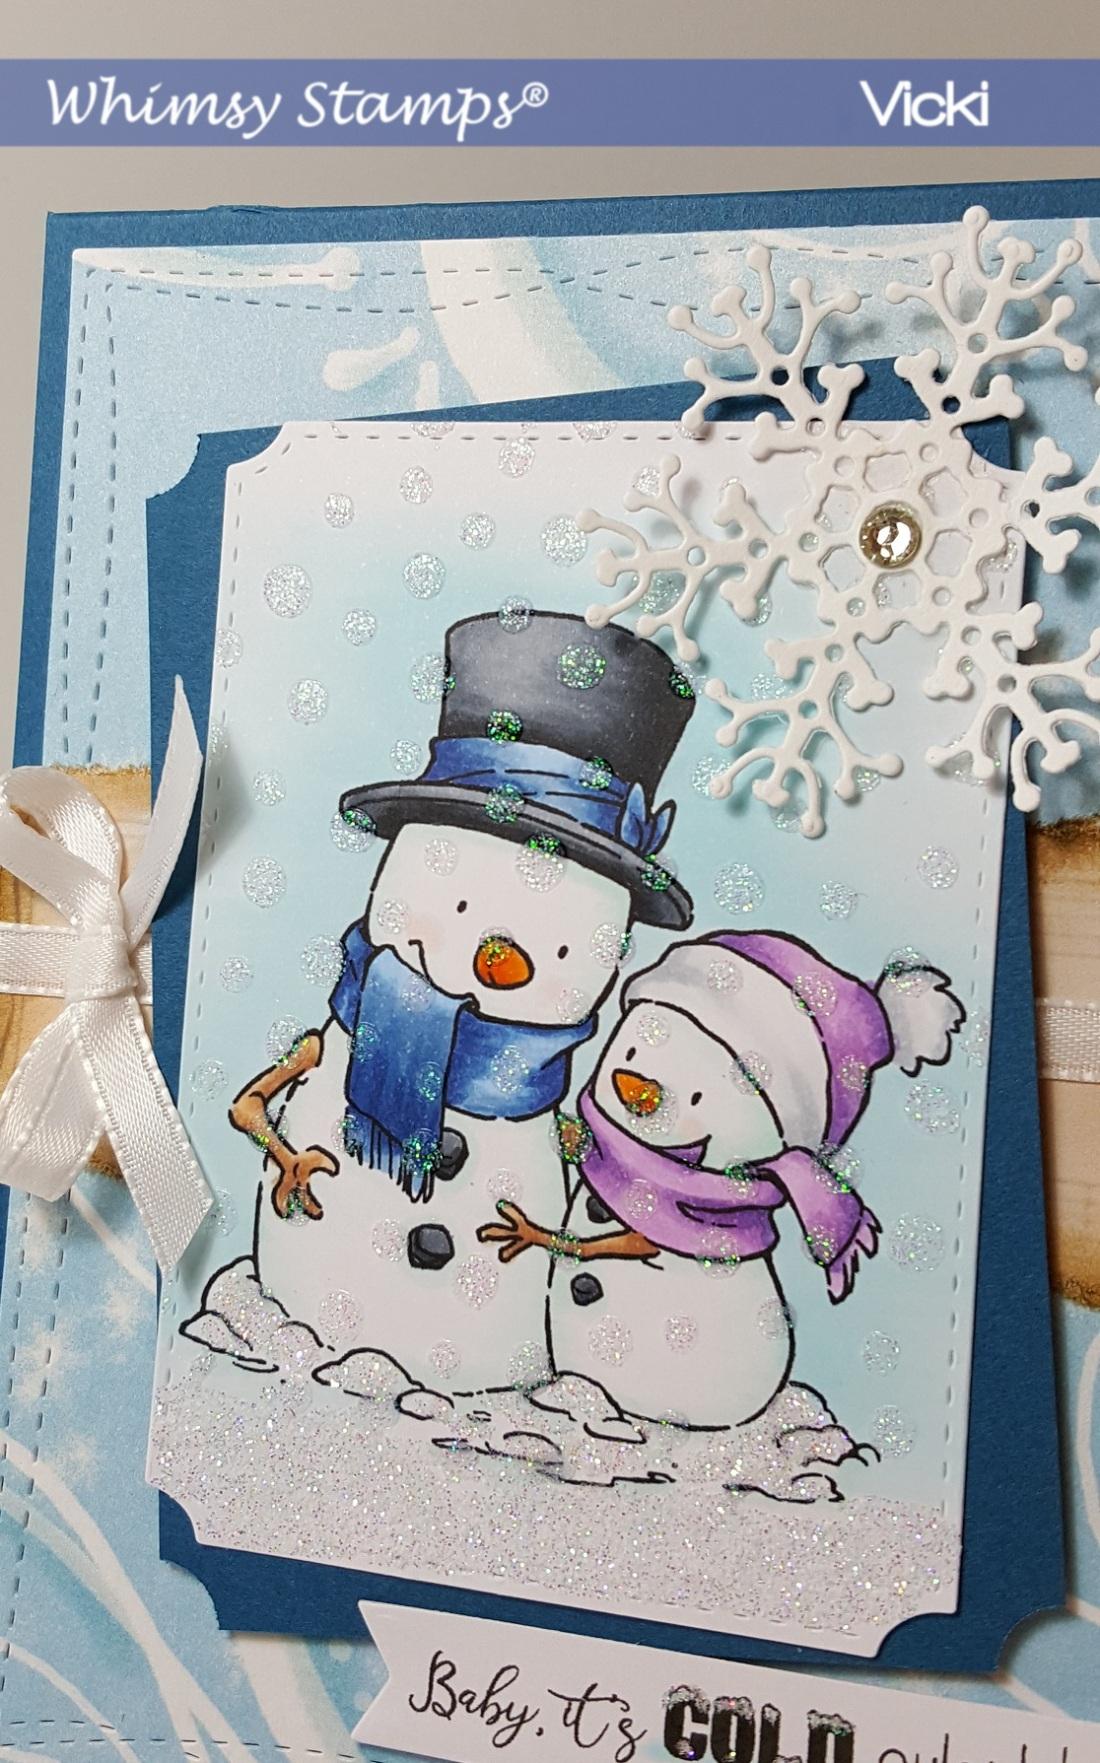 Vicki-WS-SnowmanCouple-Dec3-close